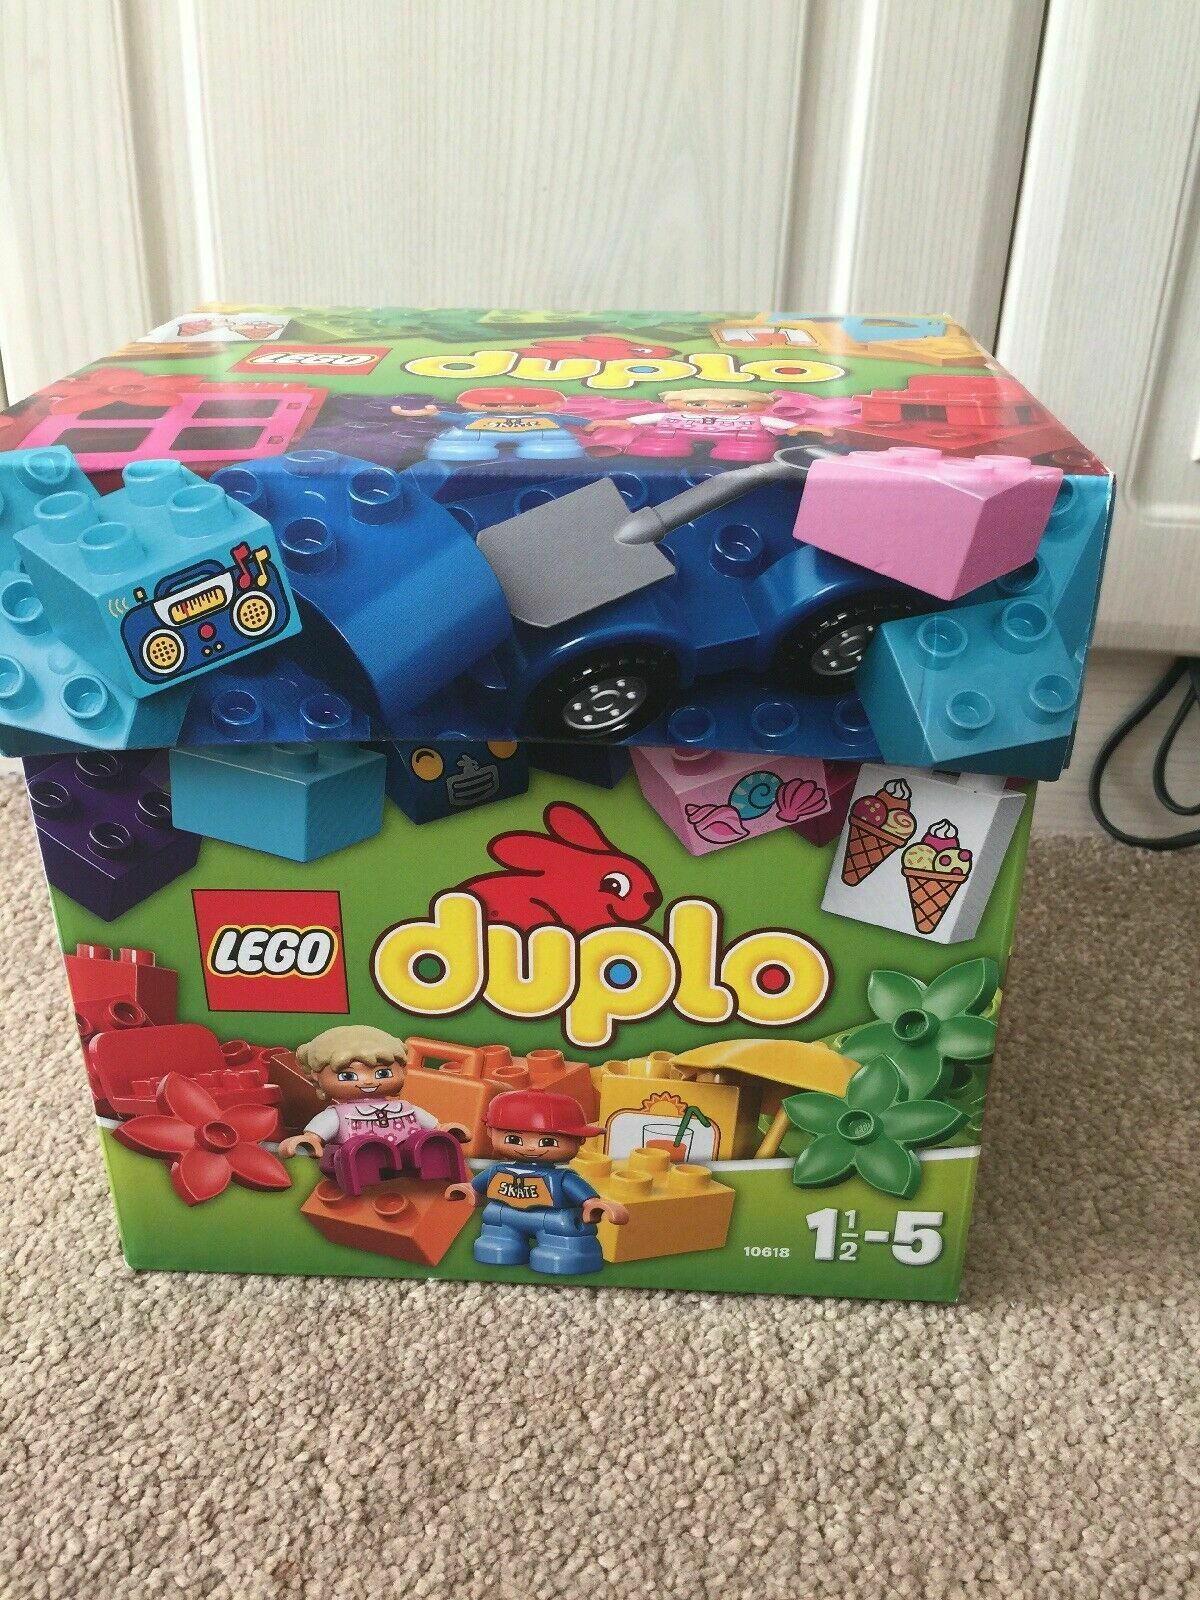 LEGO DUPLO 10618  Creative Building Box - Discontinued Retirot Set